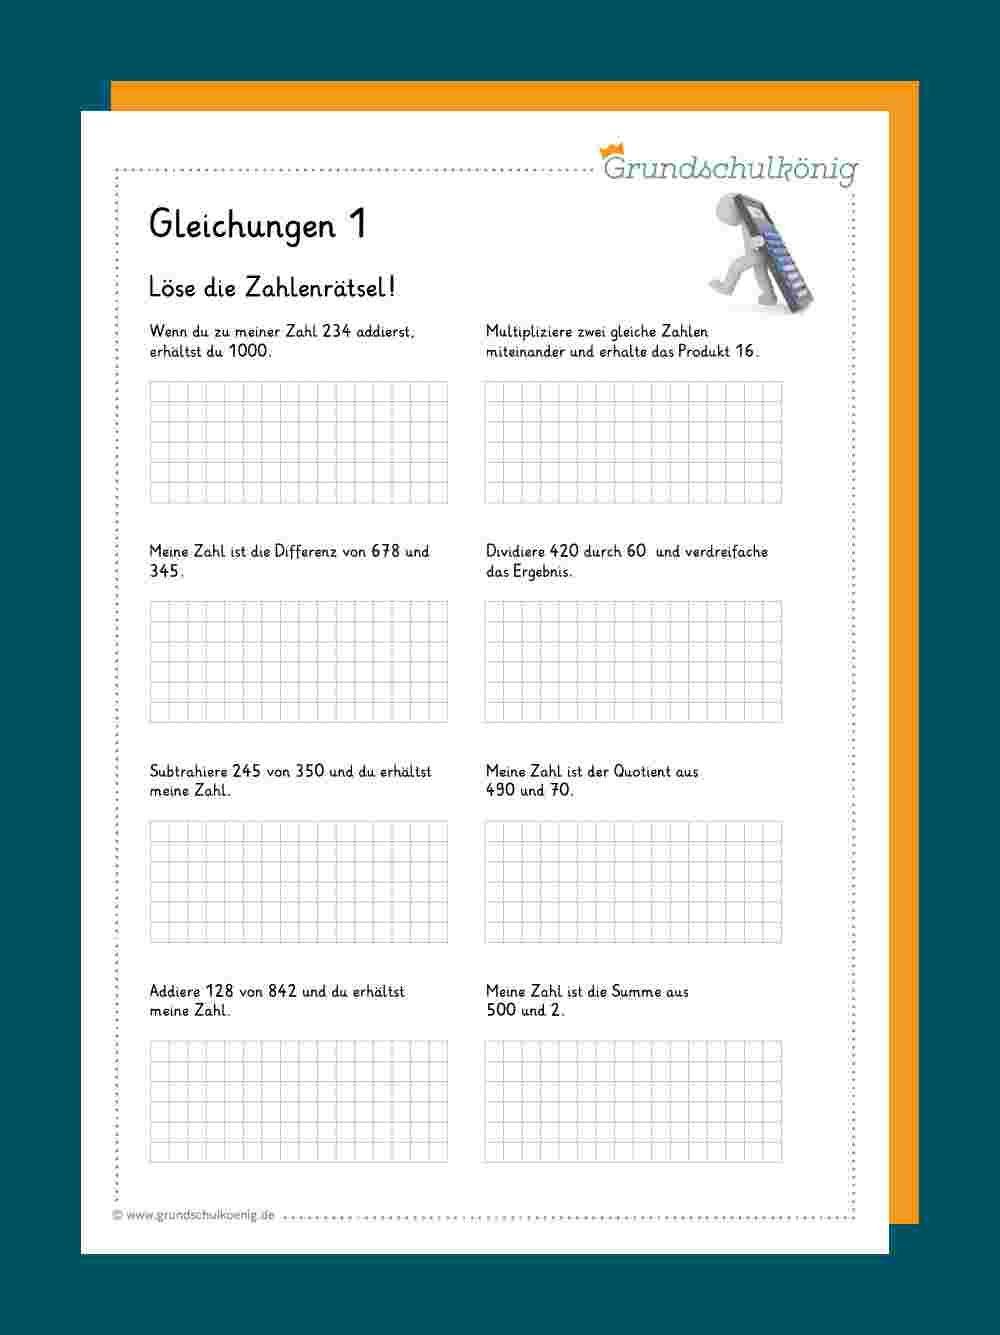 Gleichungen / Zahlenrätsel   Gleichungen, Zahlenrätsel, Mathematik ...